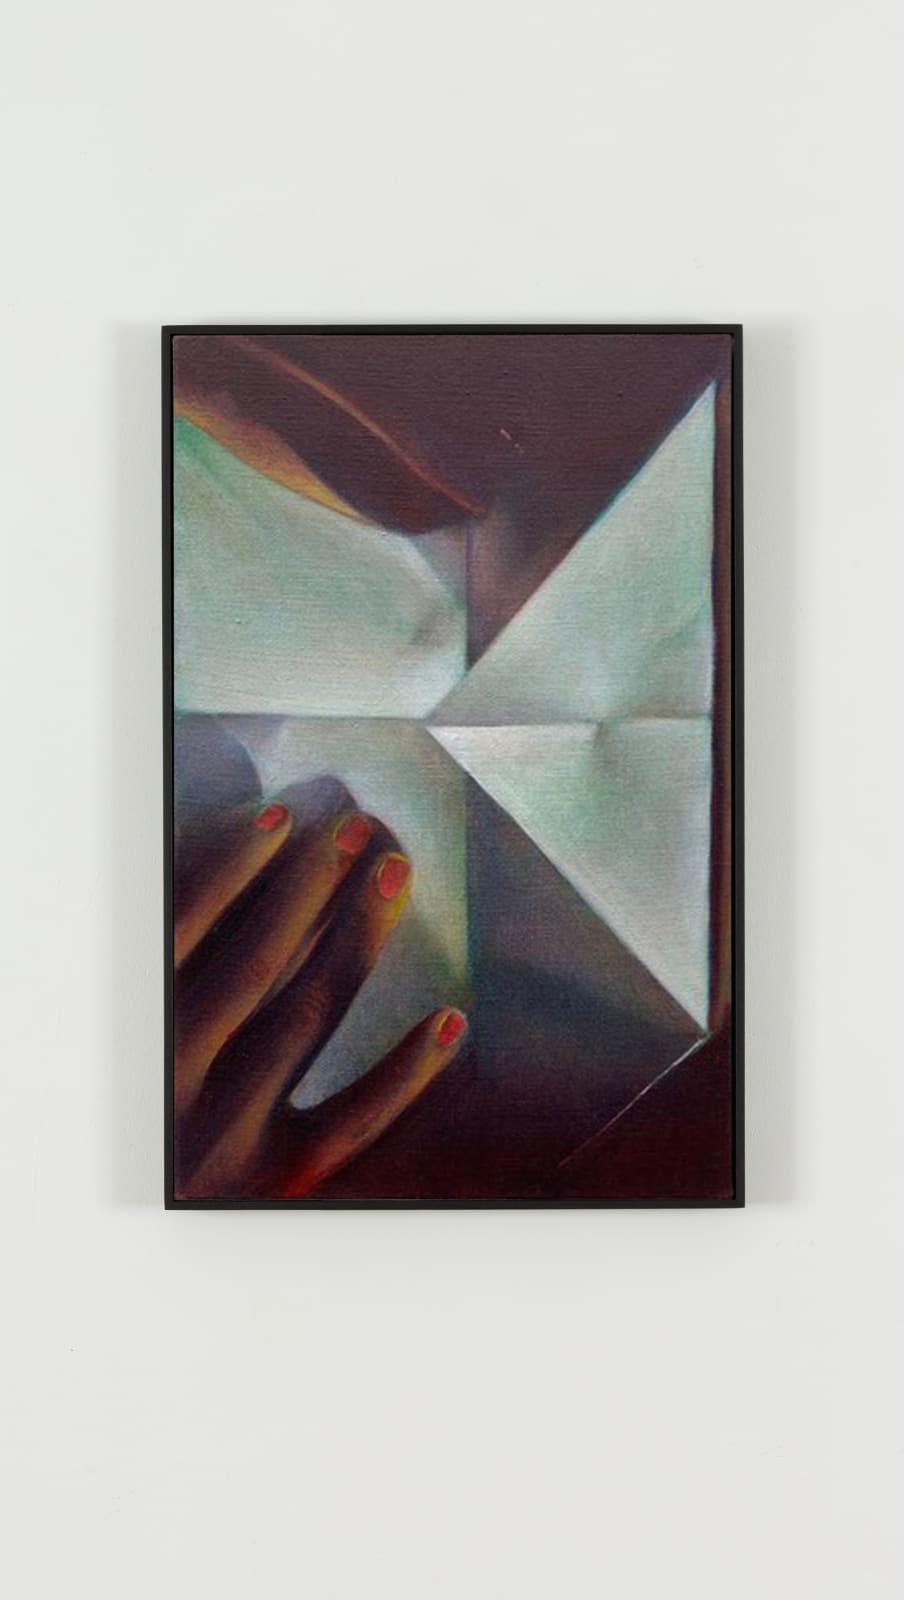 Louise Giovanelli, Node, 2020